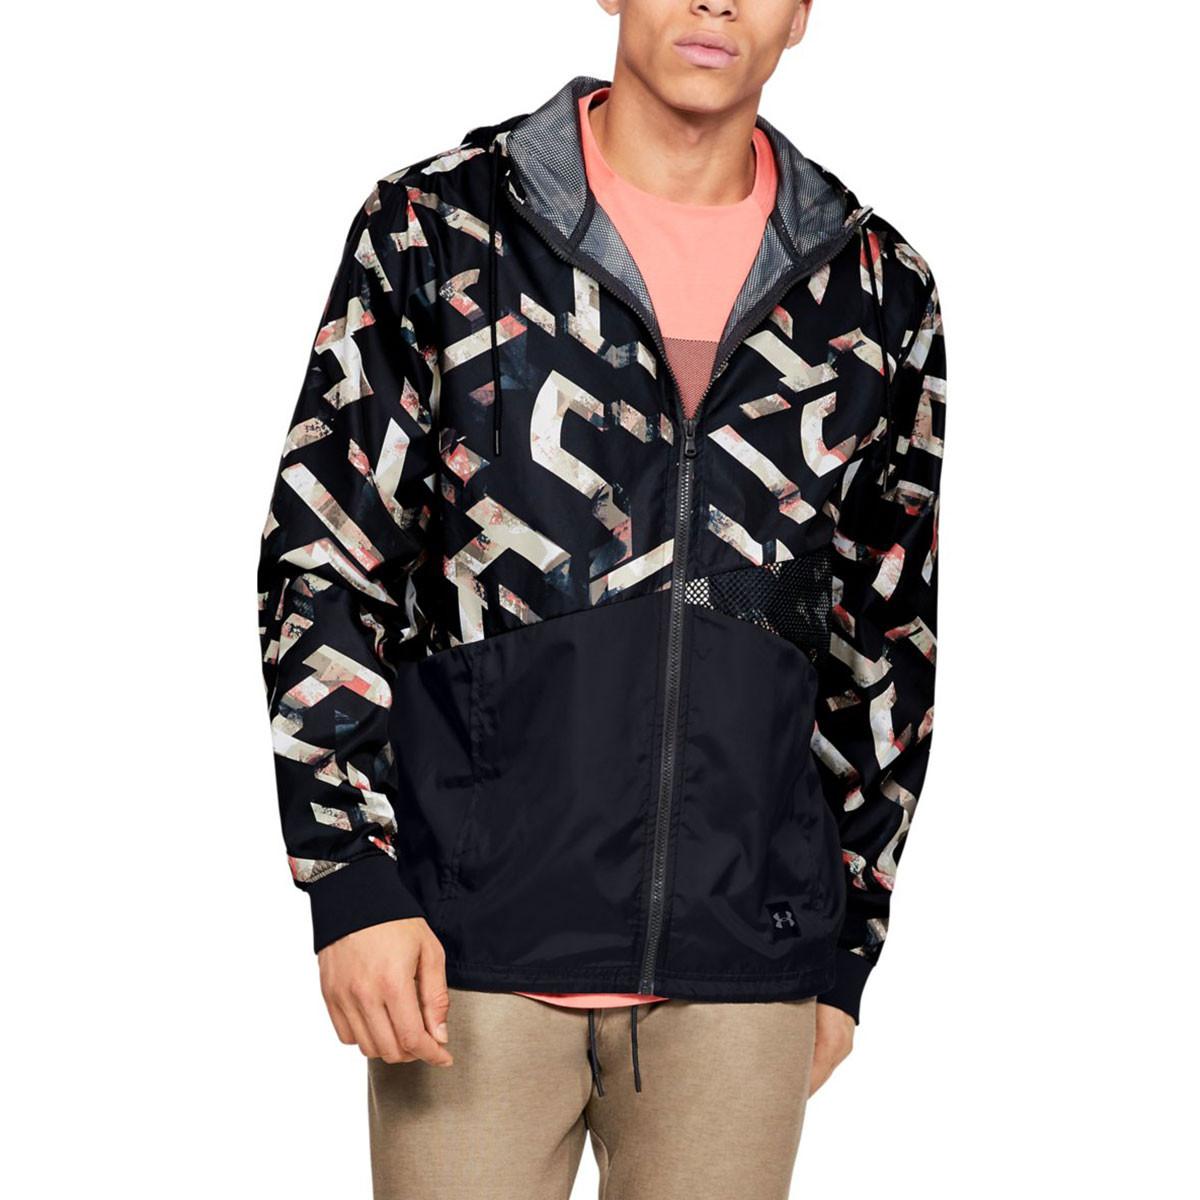 8d9fe155d1 Under Armour Mens 2019 Unstoppable Windbreaker Jacket